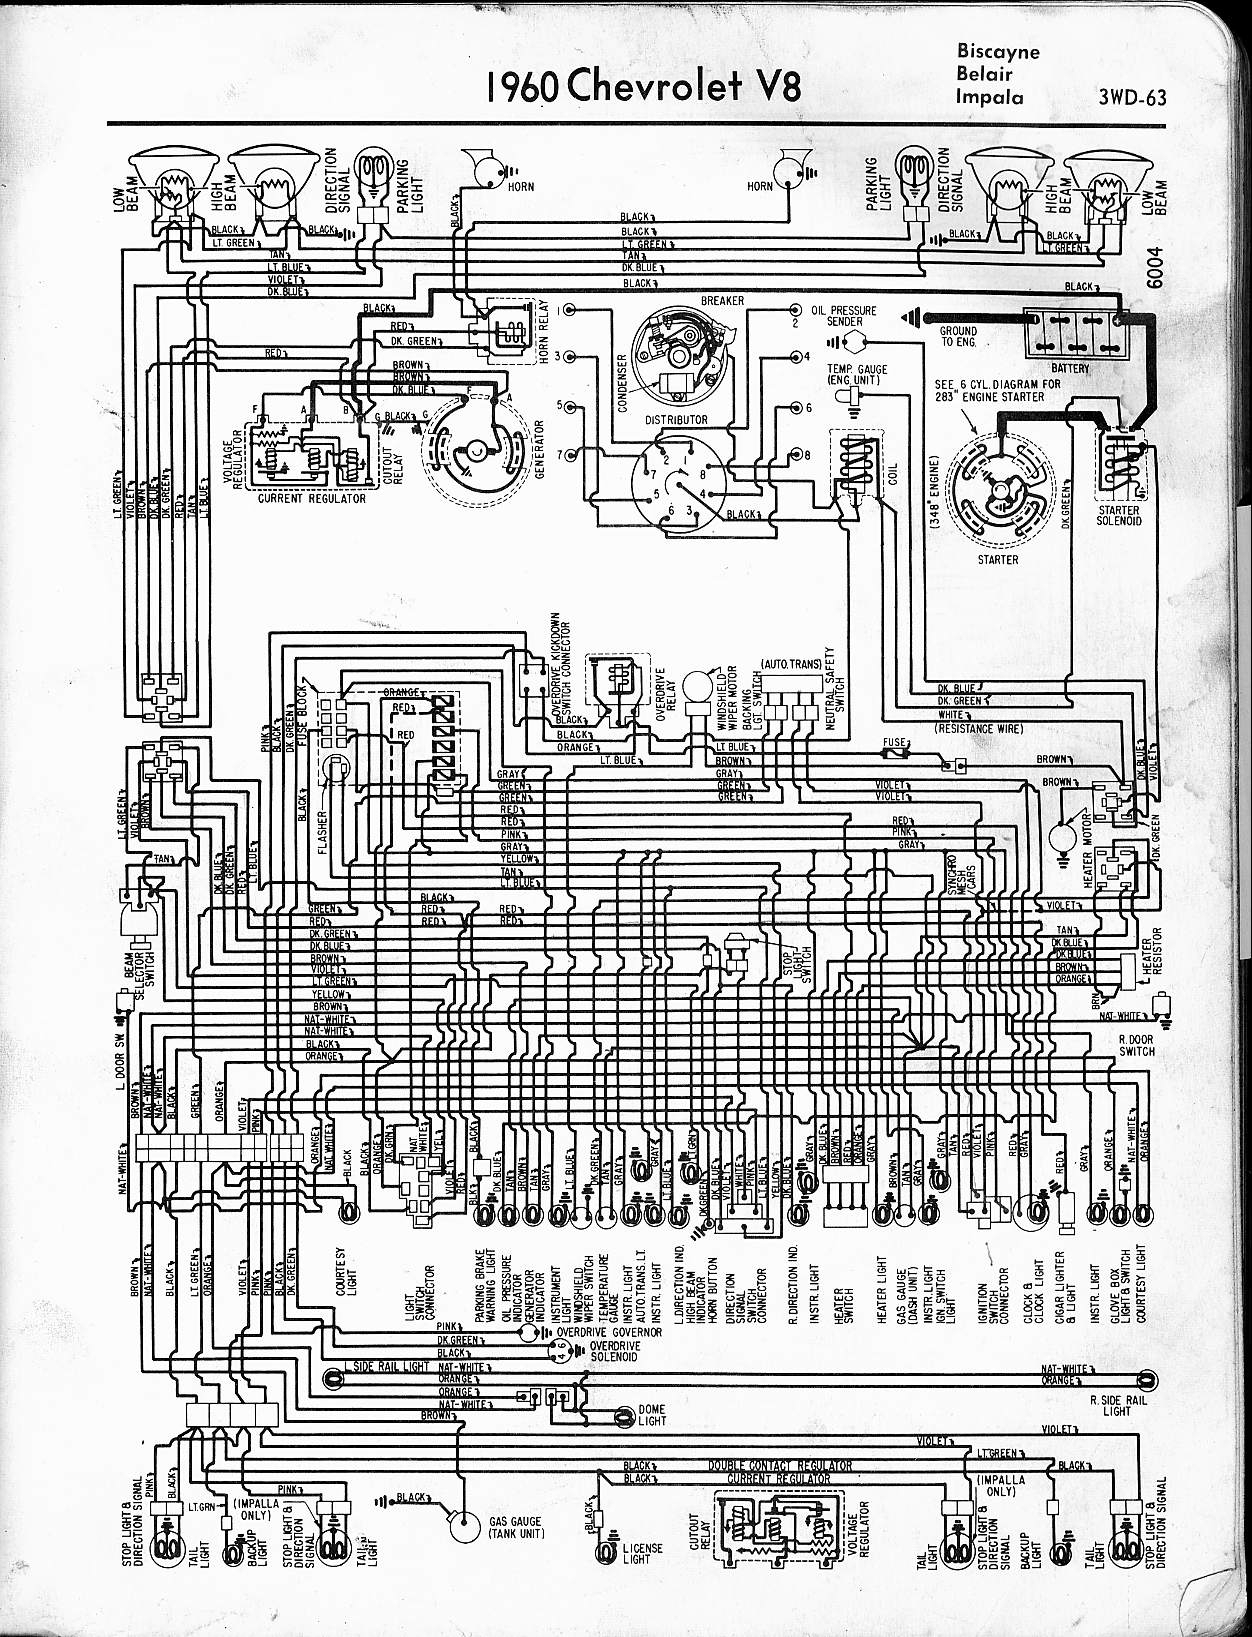 2006 chevy impala wiring diagram Download-2005 chevy impala wiring diagram 18-n